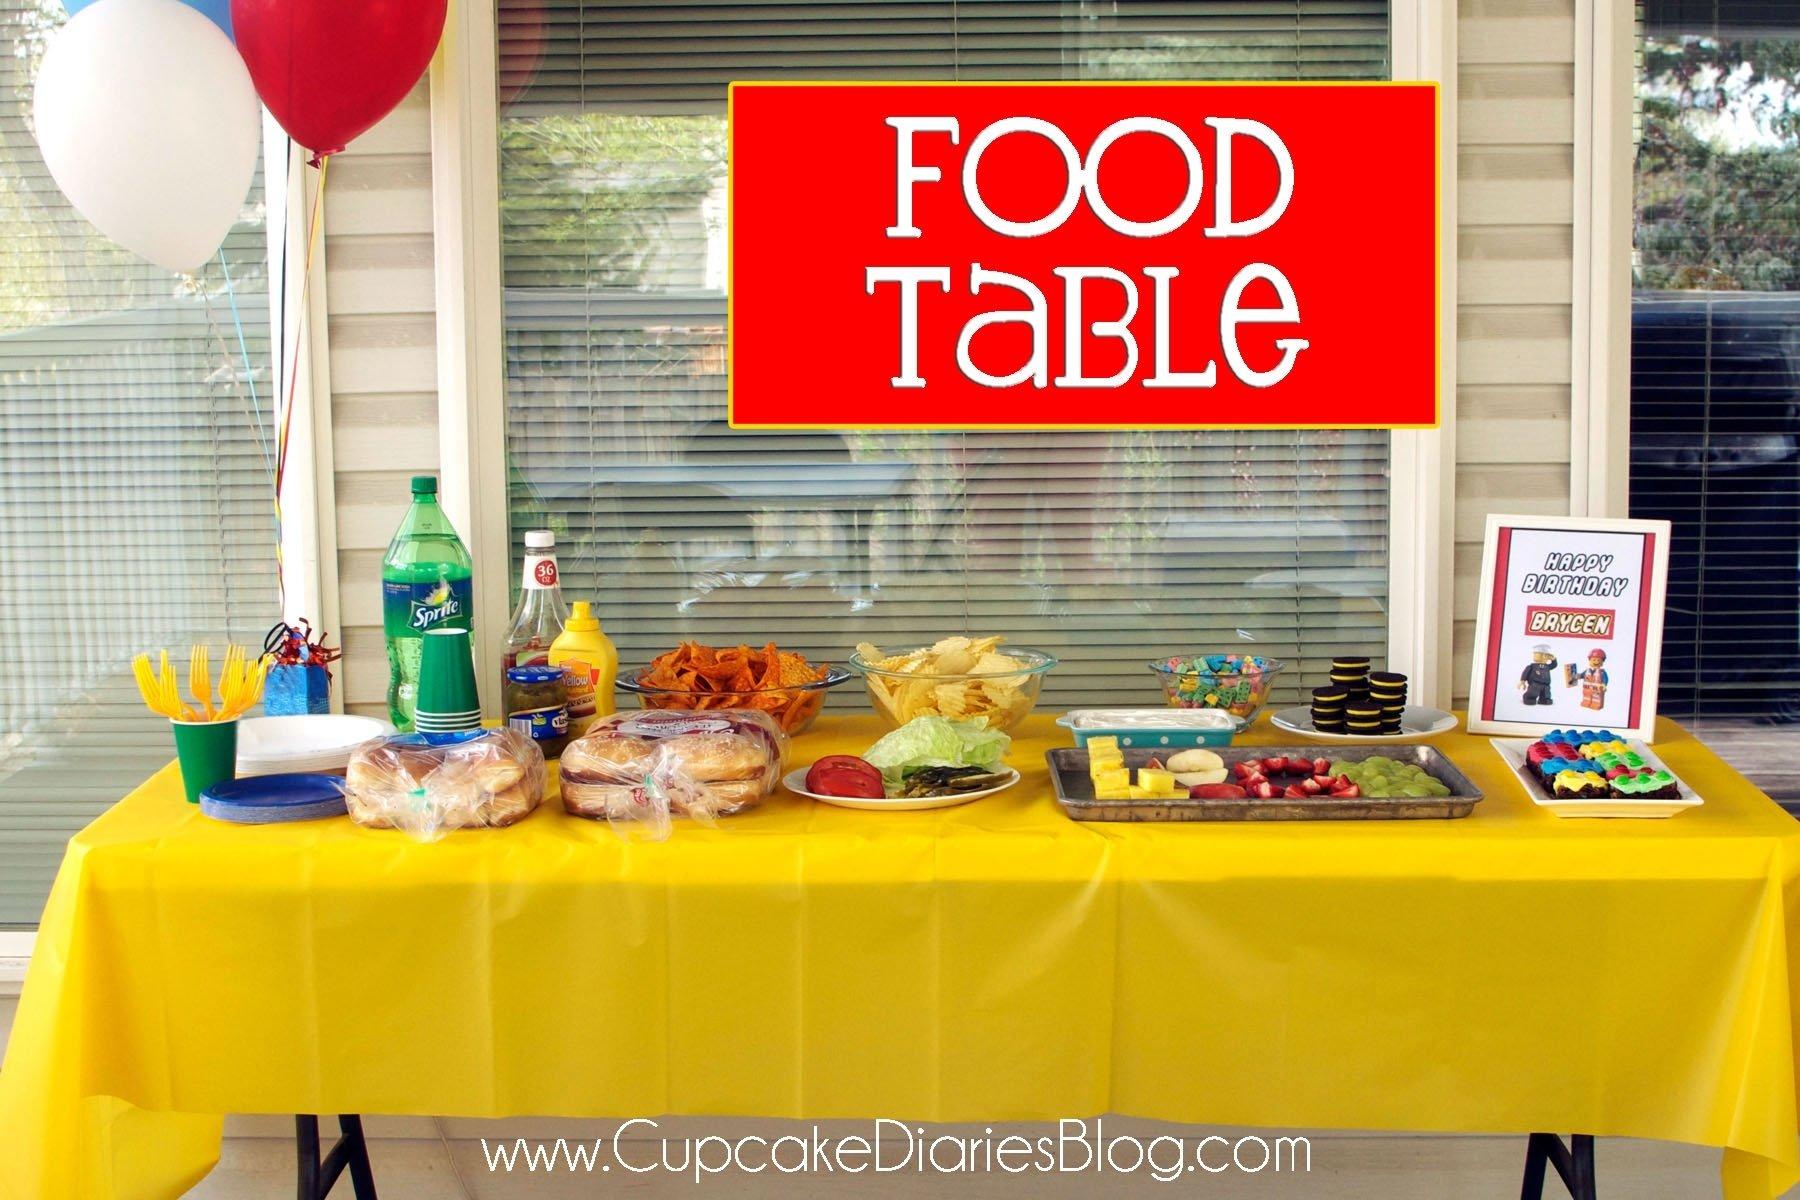 10 Nice Lego Birthday Party Food Ideas easy lego birthday party ideas cupcake diaries 3 2020